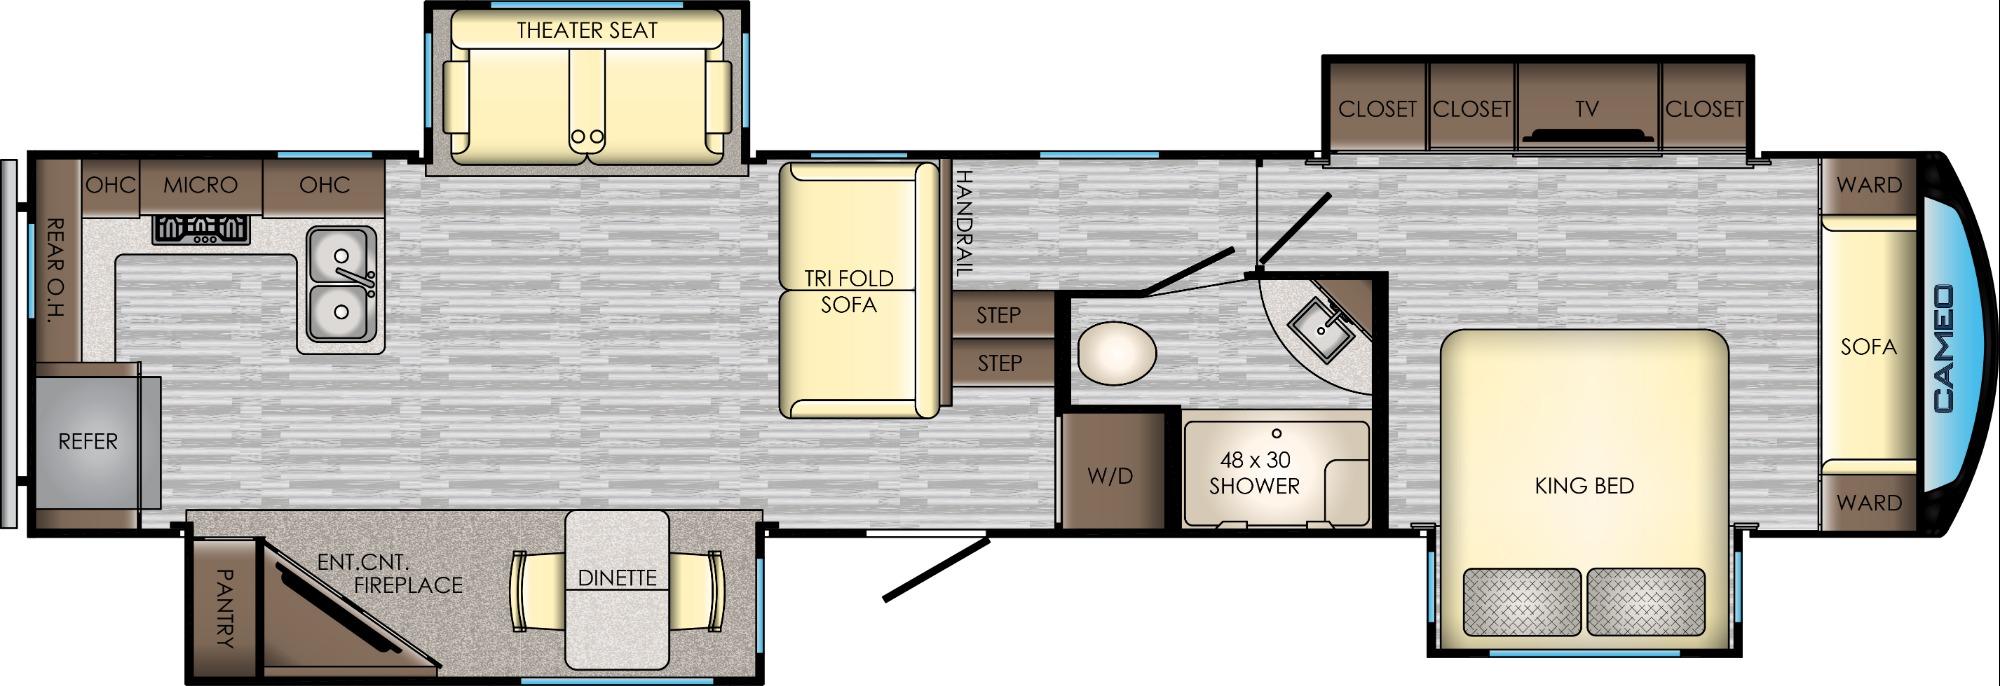 View Floor Plan for 2019 CROSSROADS CAMEO 3801RK